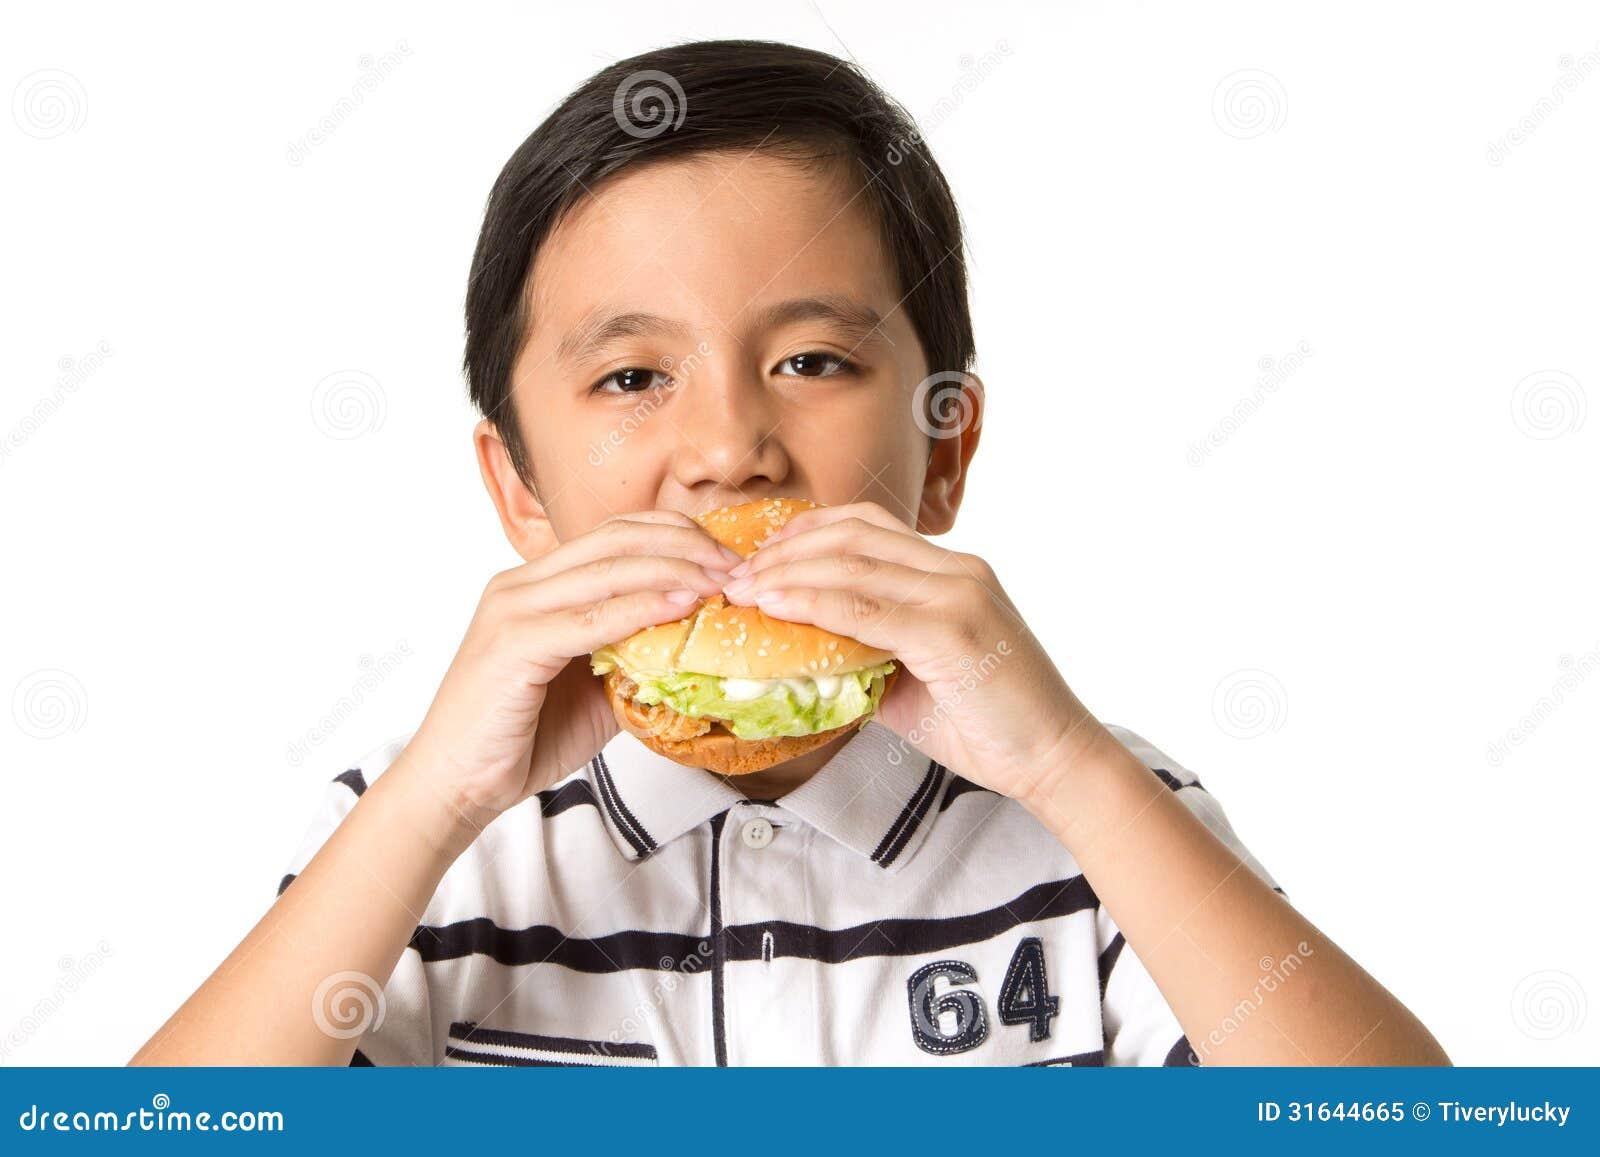 Boy Eating A Burger Royalty Free Stock Photo - Image: 31644665